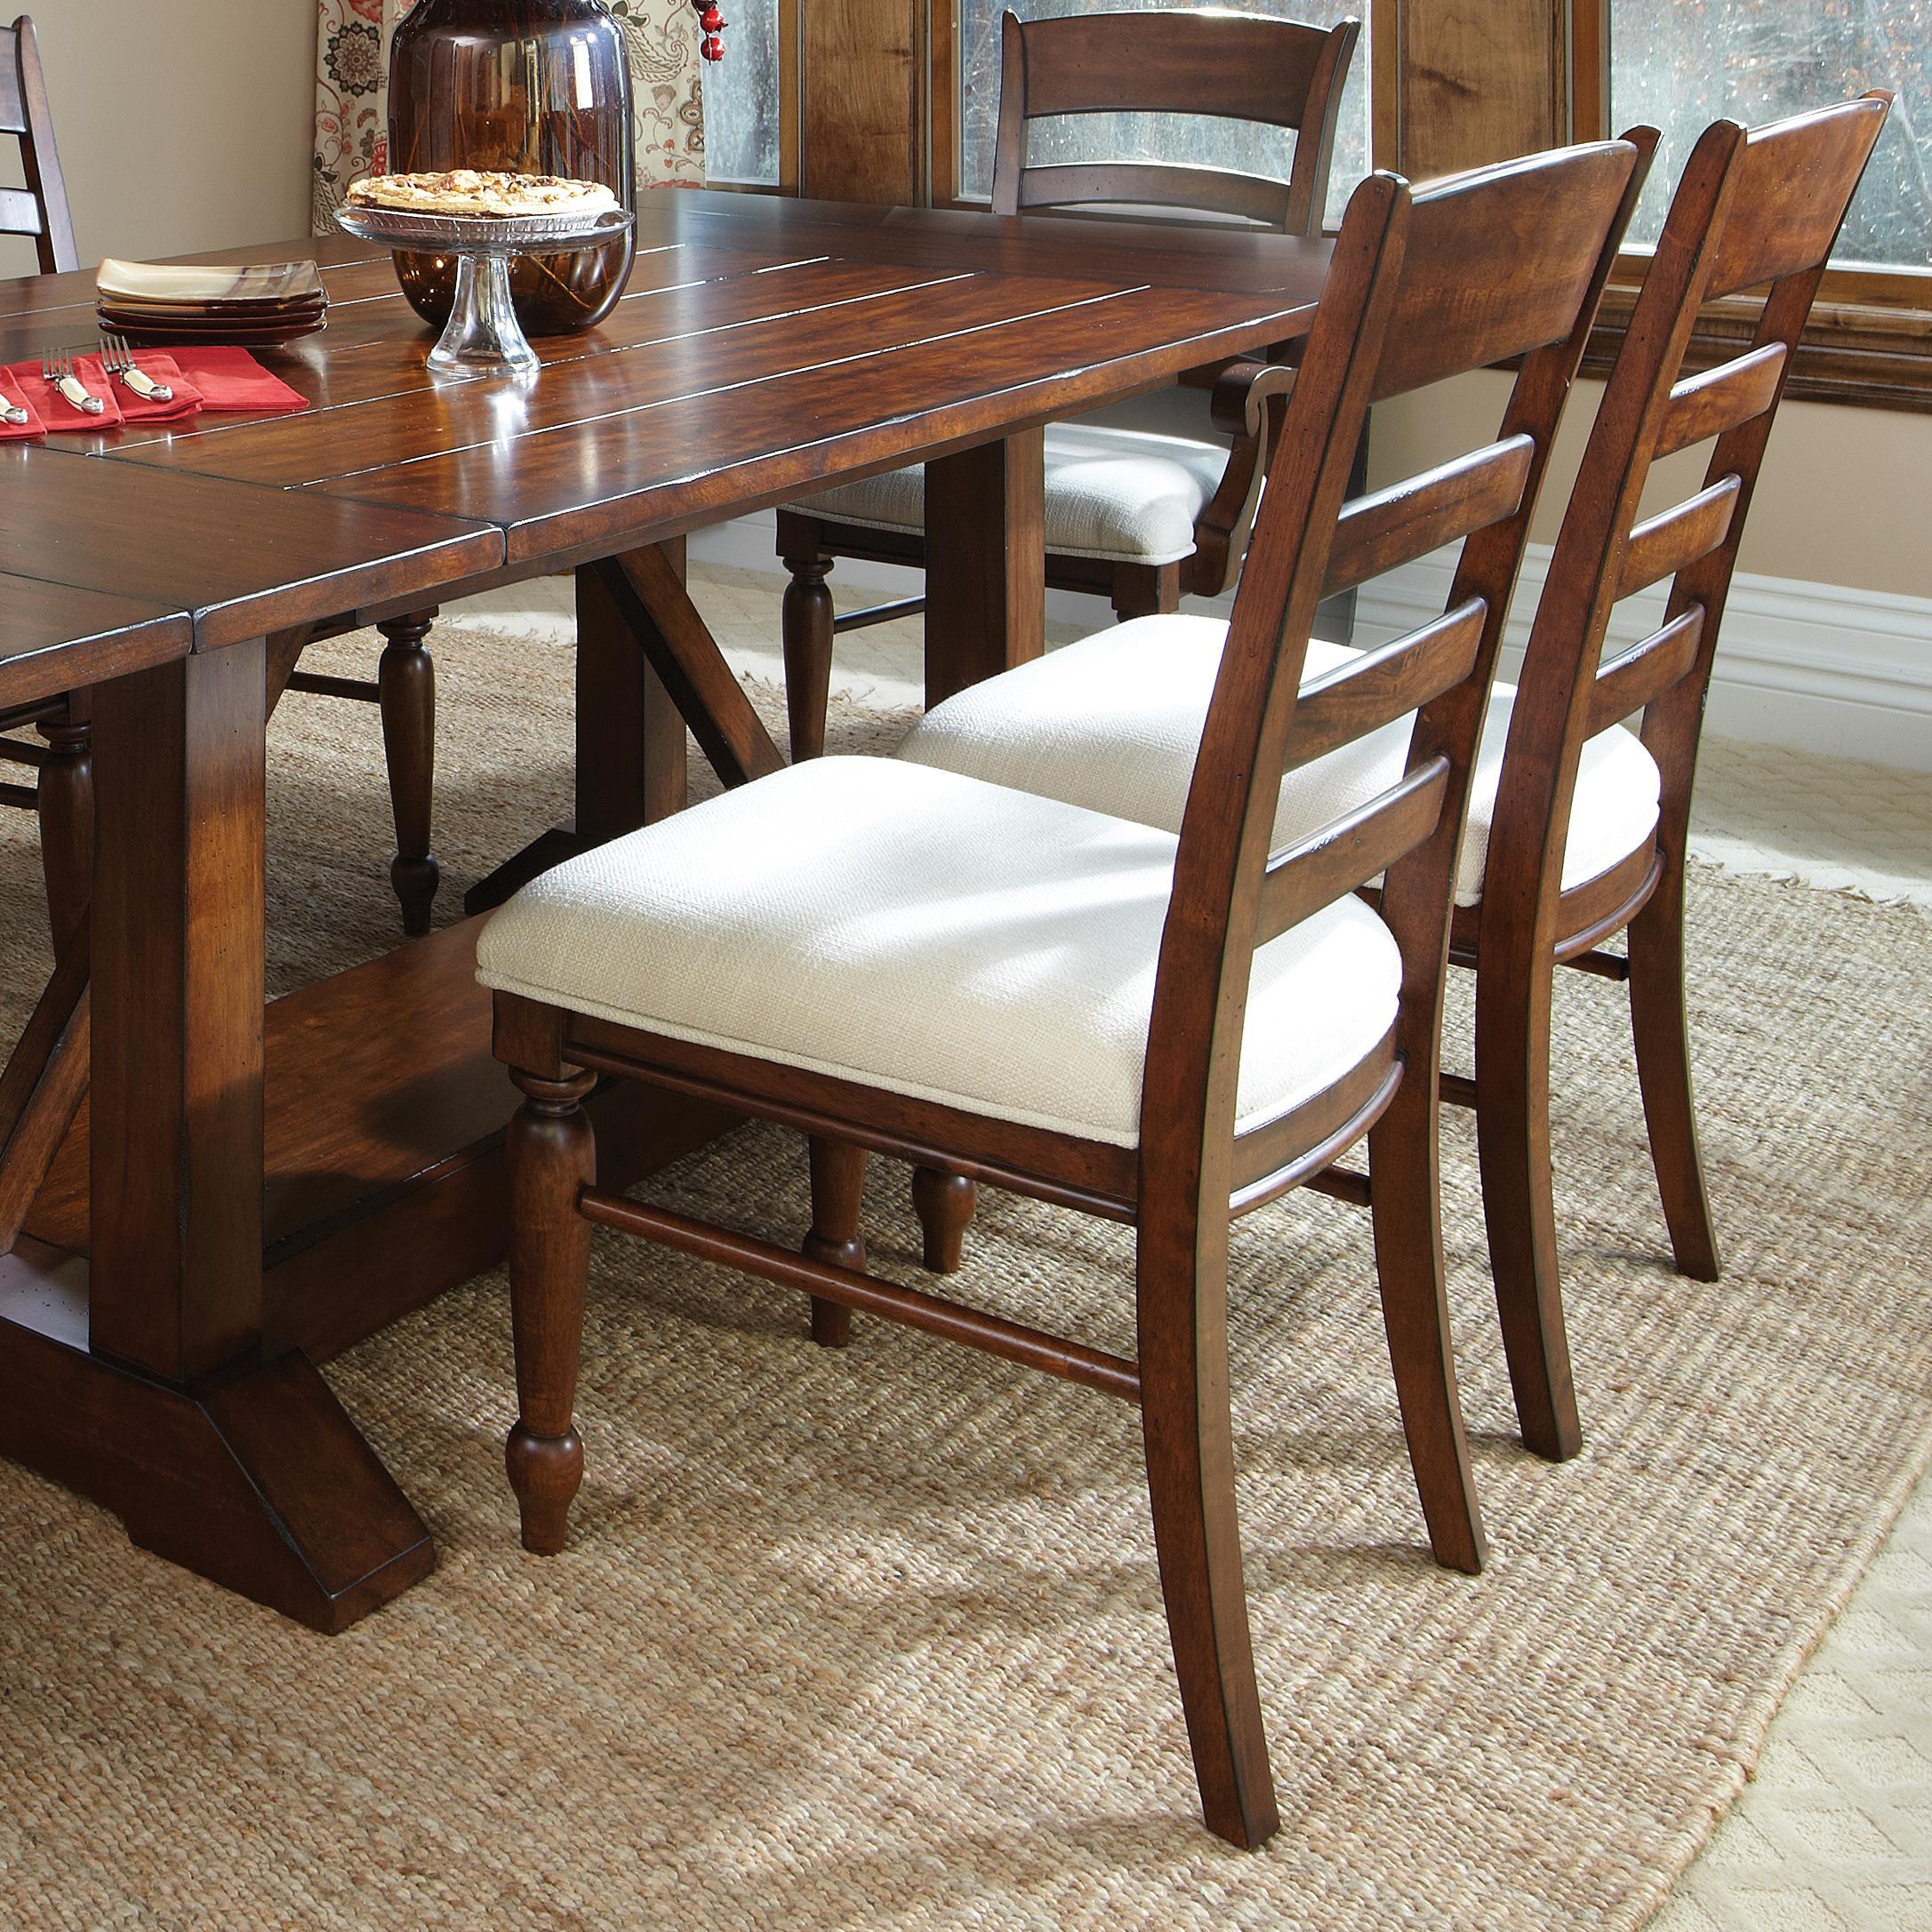 Ordinaire Carolina Preserves By Klaussner Blue RidgeCherry Ladder Back Side Chair ...